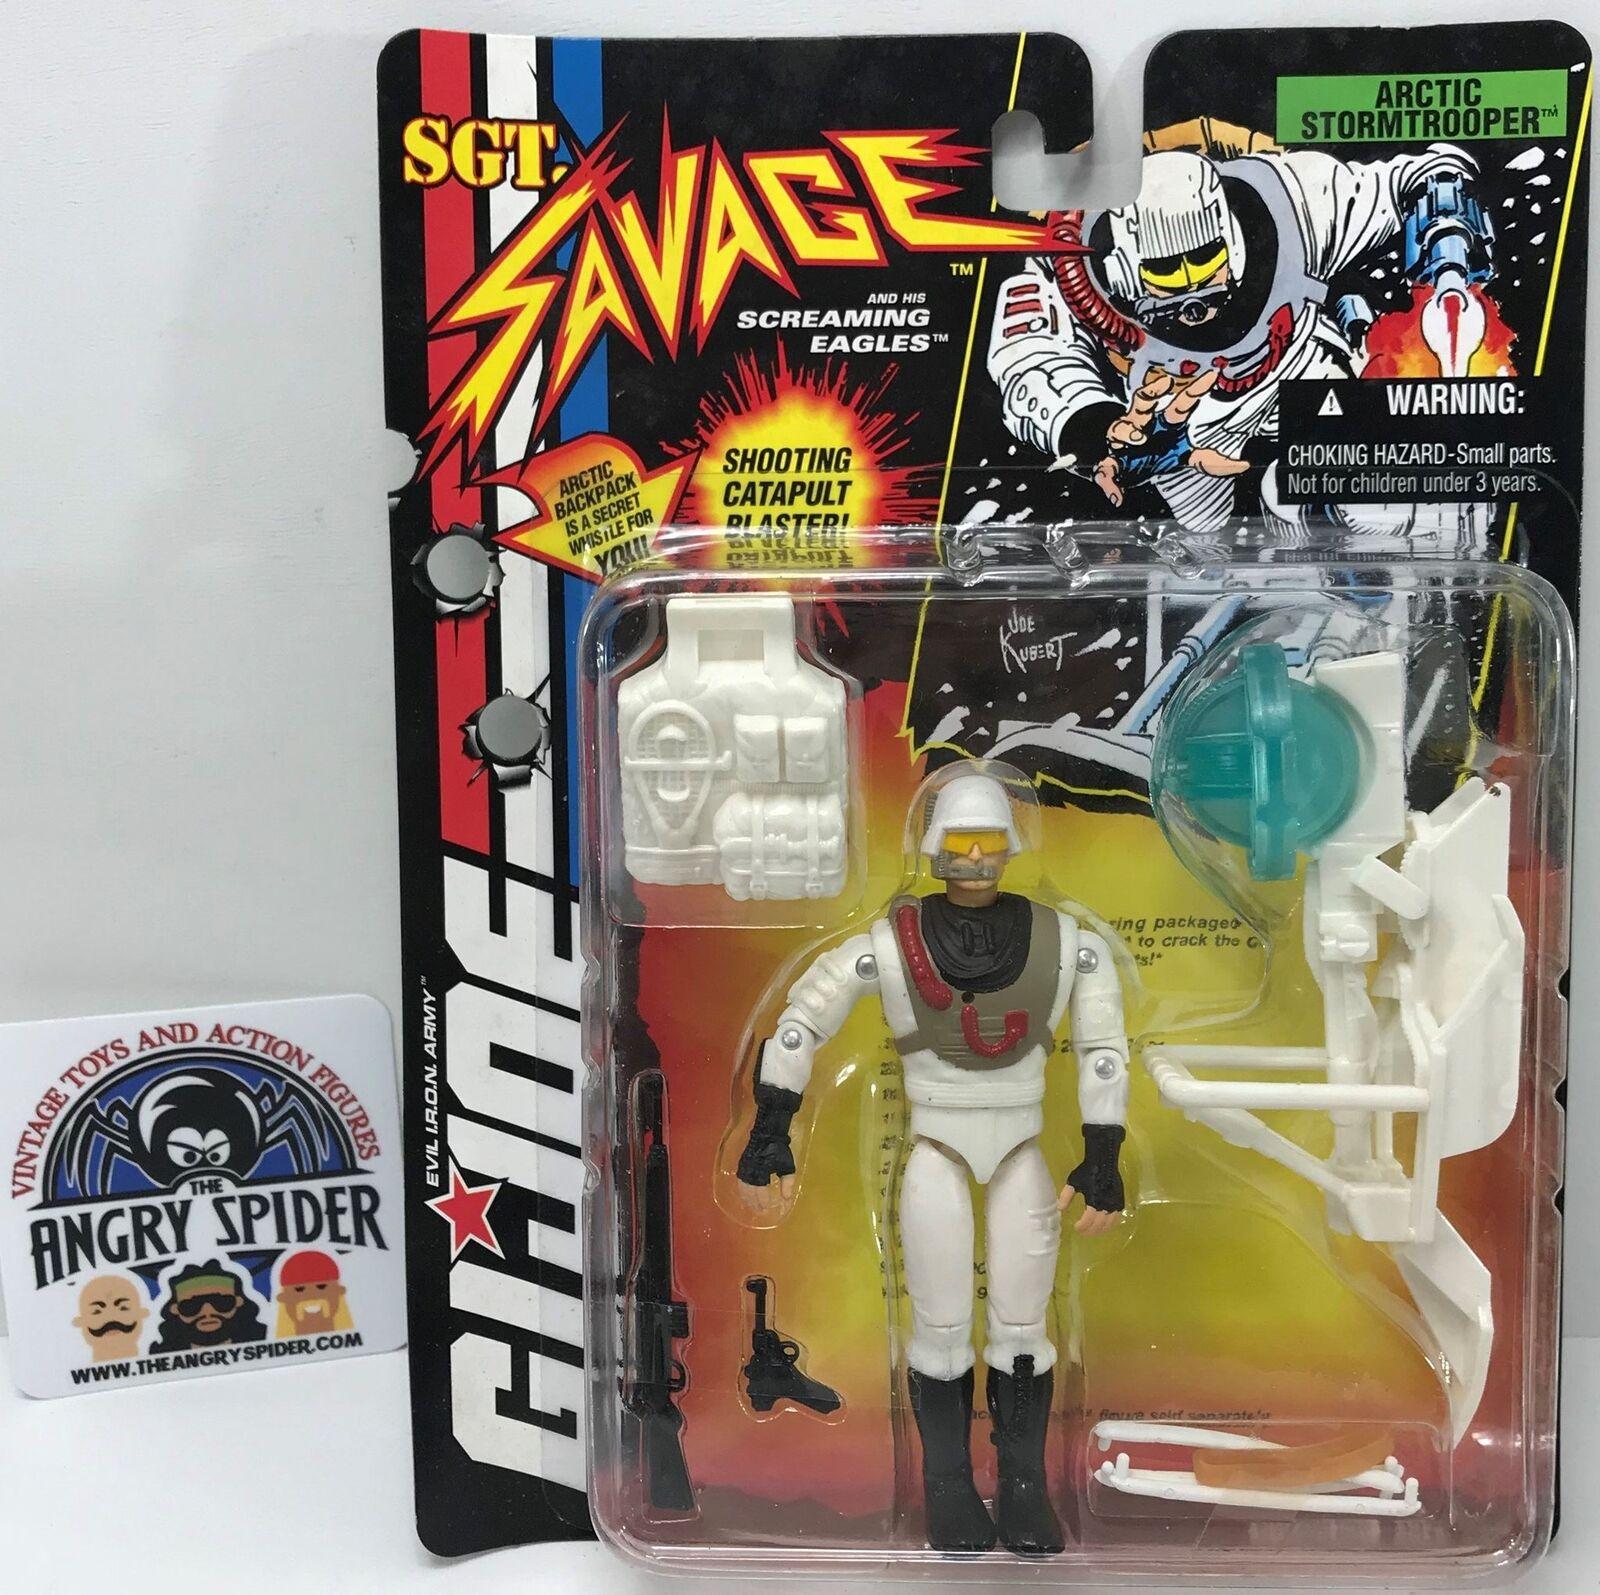 TAS040380 - 1994 Hasbro G.I. Joe SGT. Savage Action Figure - Arctic Stormtrooper